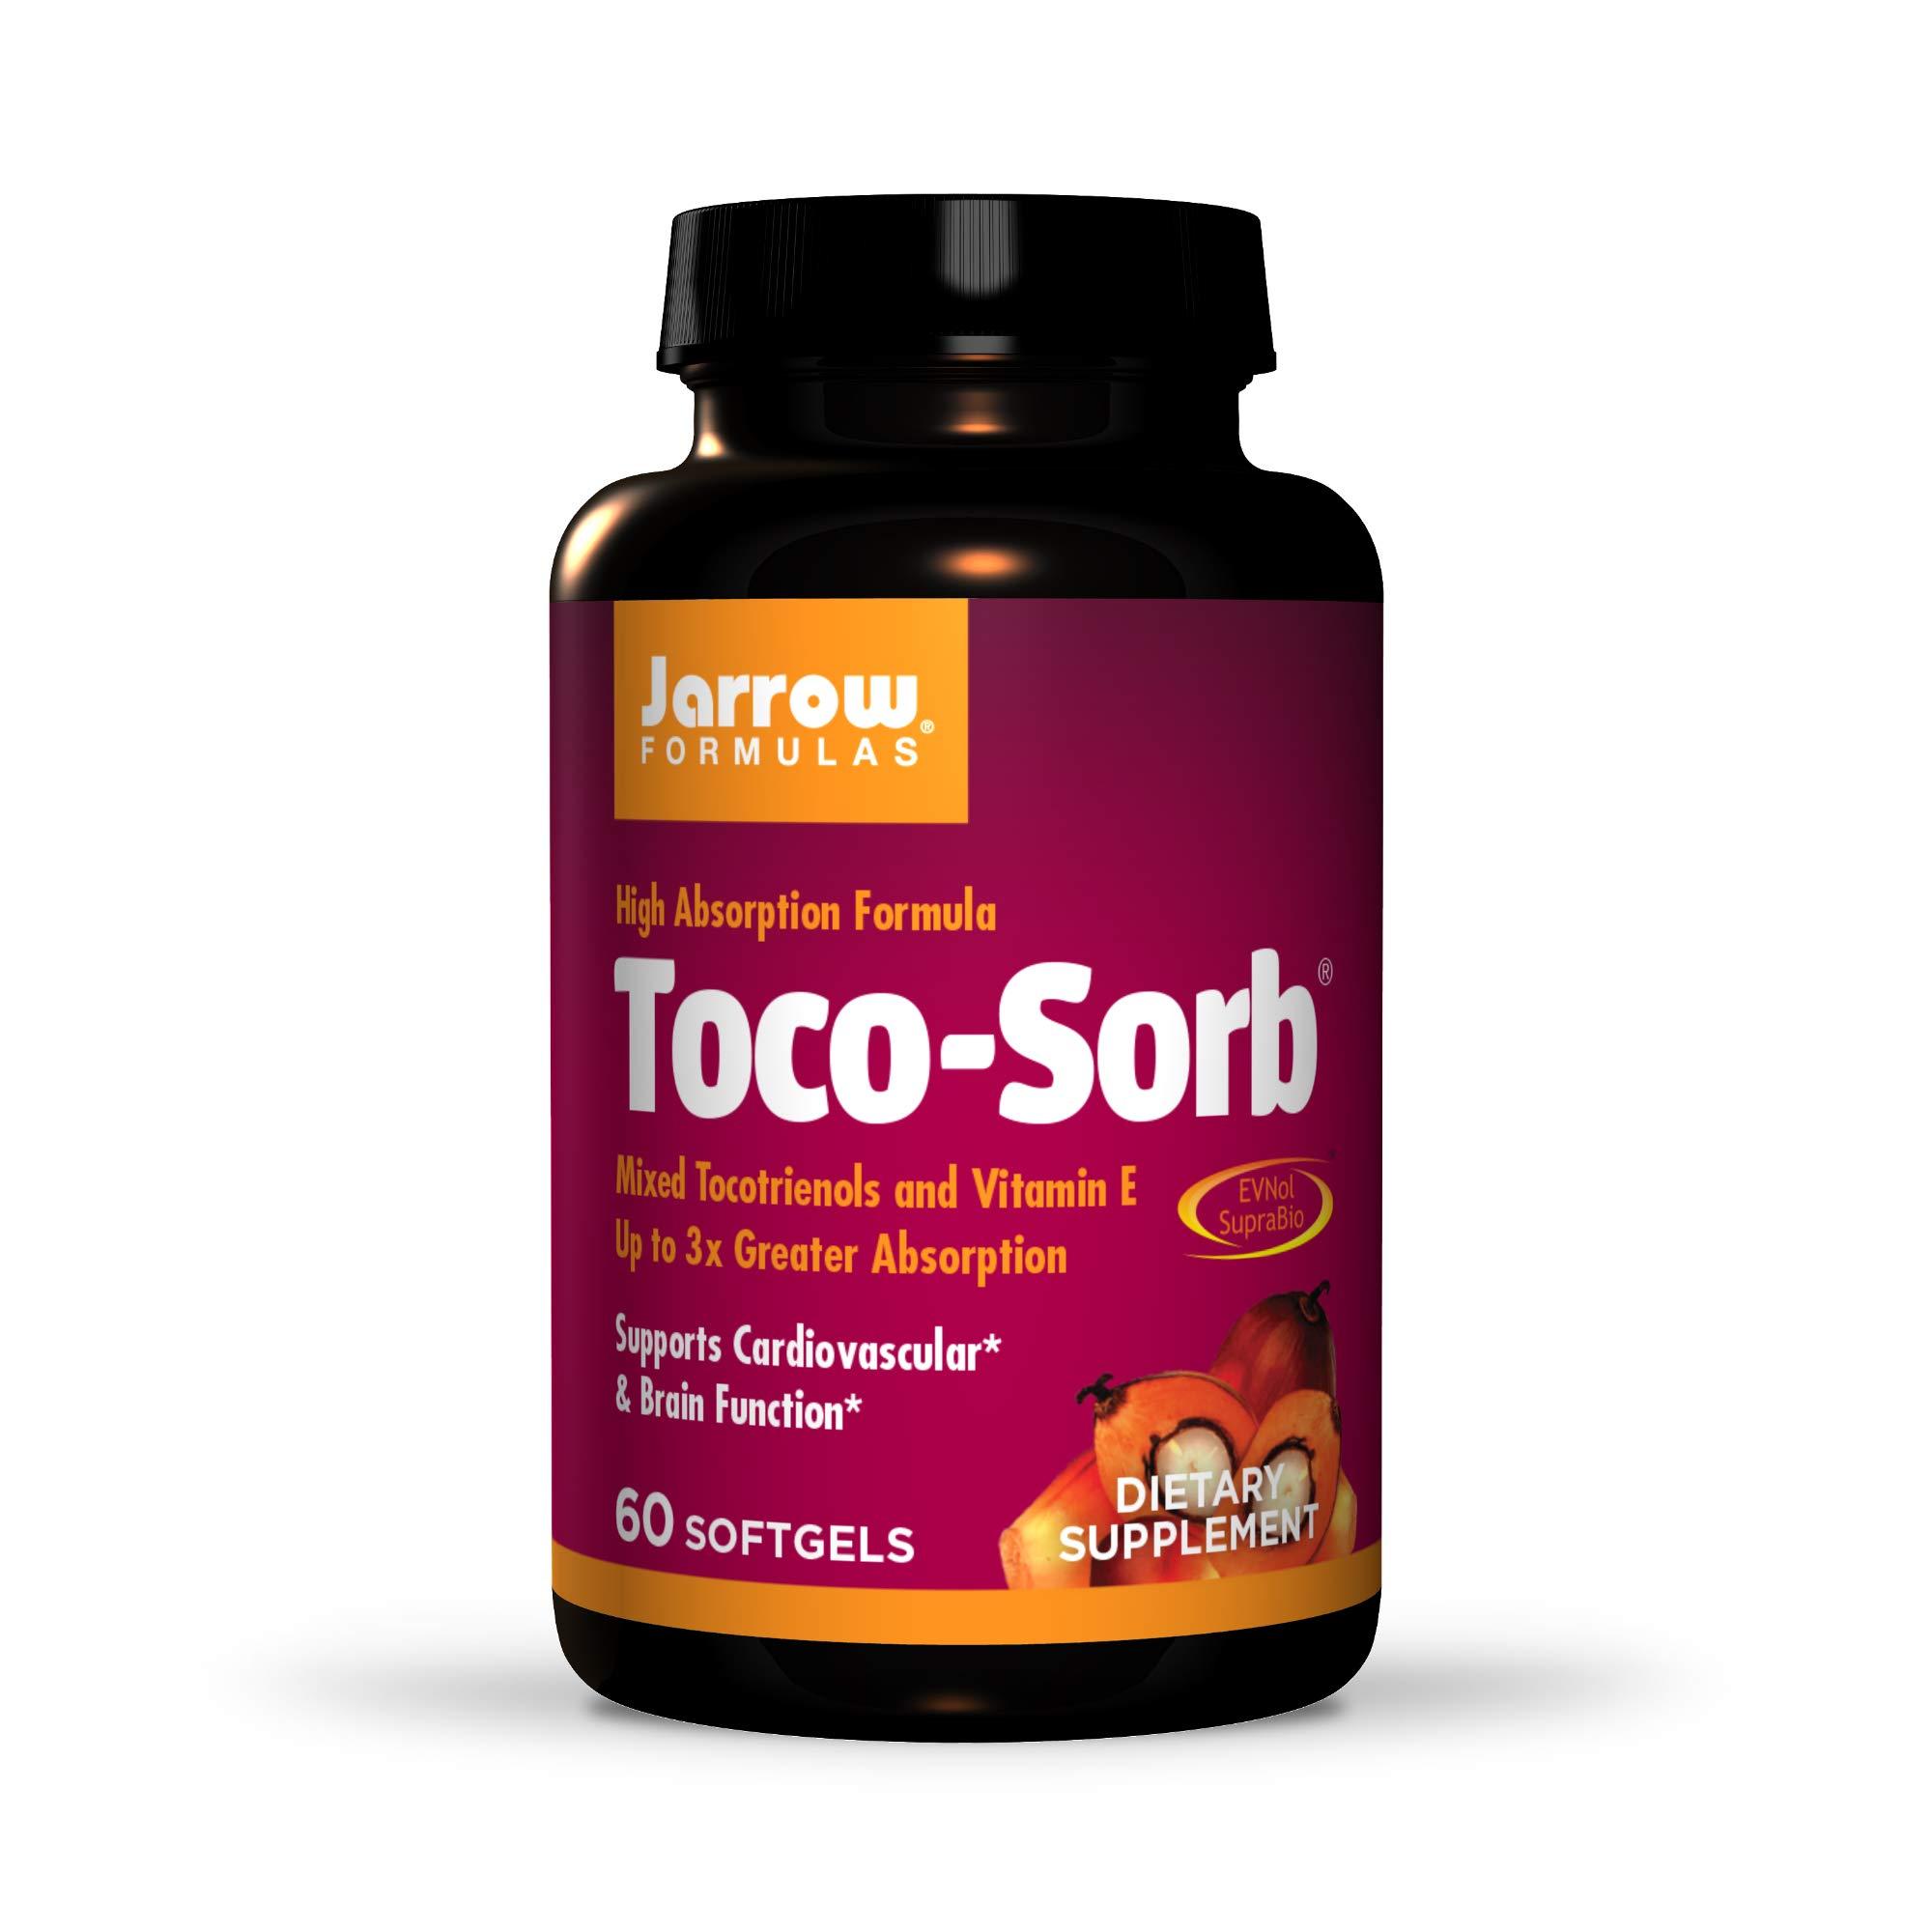 Jarrow Formulas Toco-Sorb, Supports Healthy Cardiovascular & Brain Function, 60 Softgels